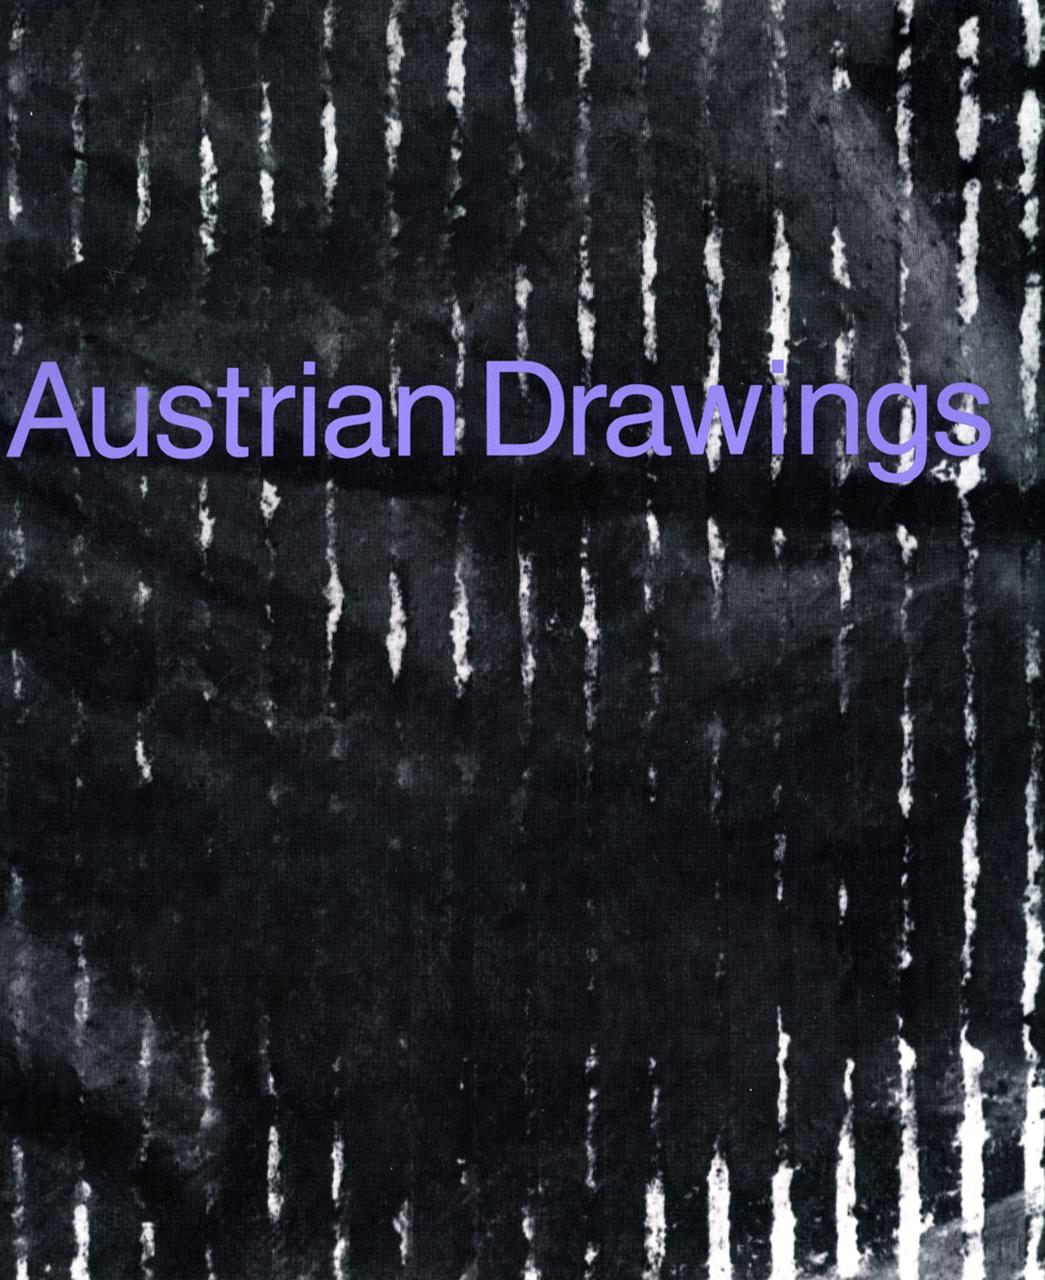 Austrian Drawings